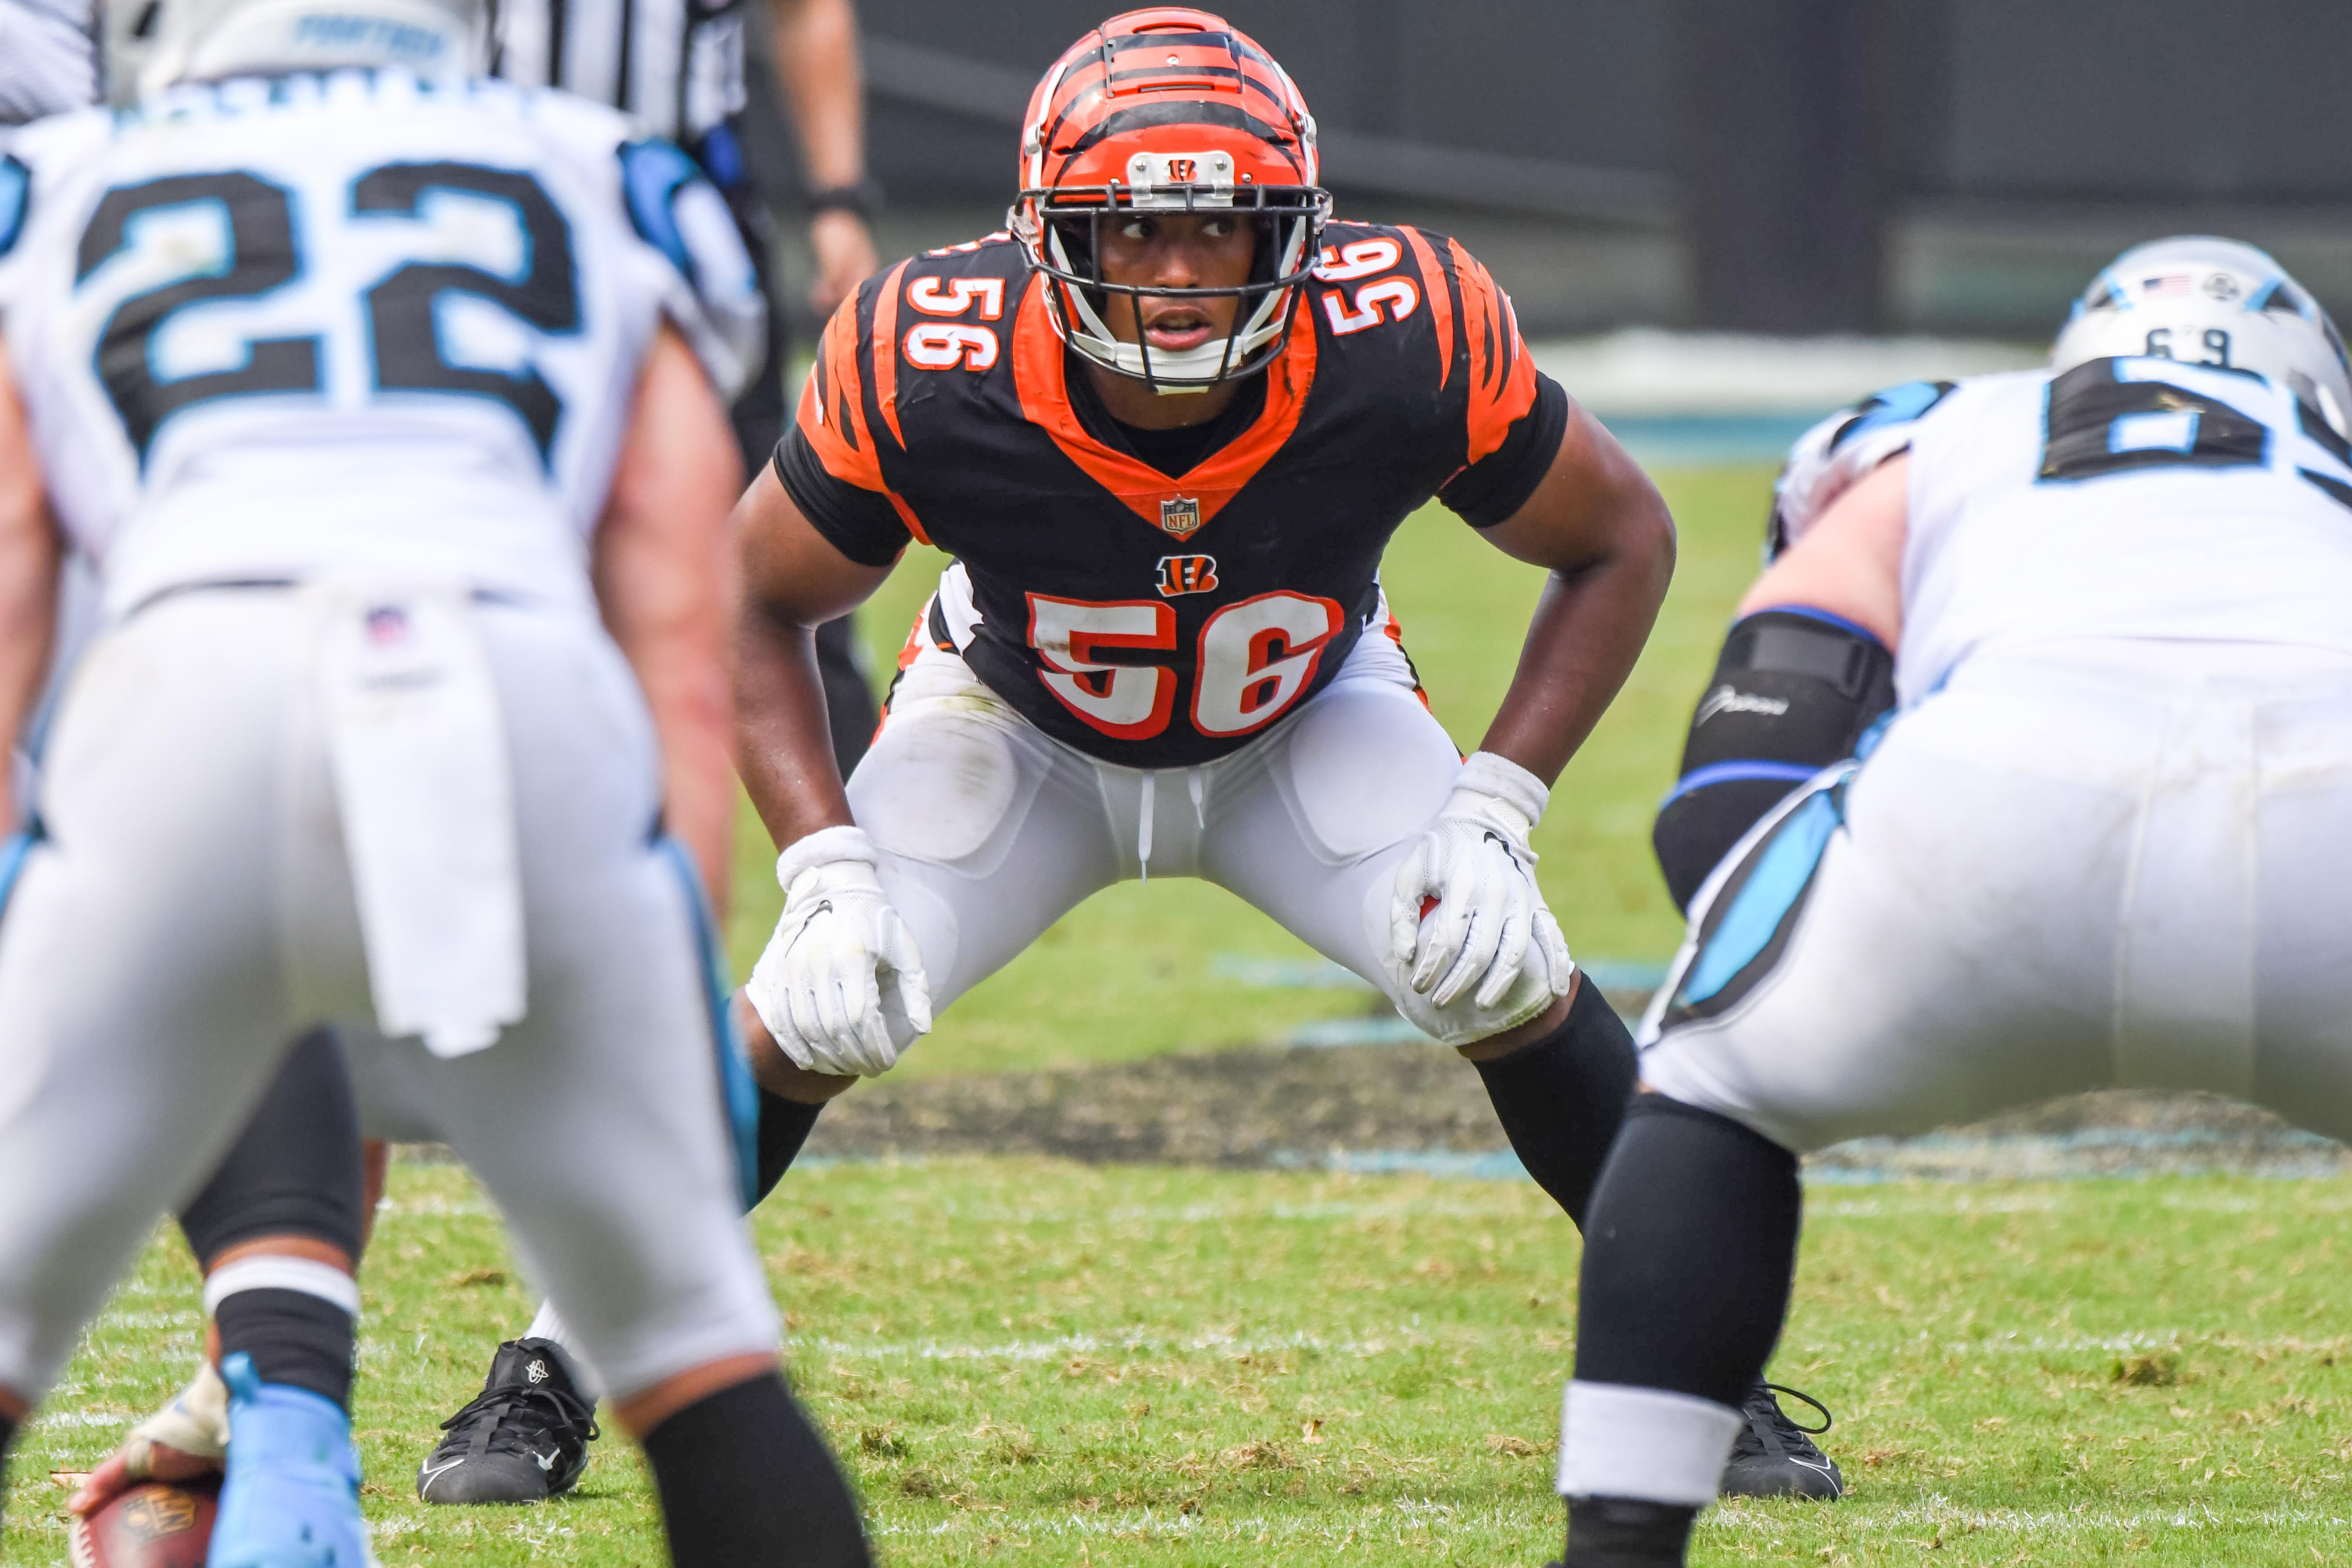 NFL: SEP 23 Bengals at Panthers